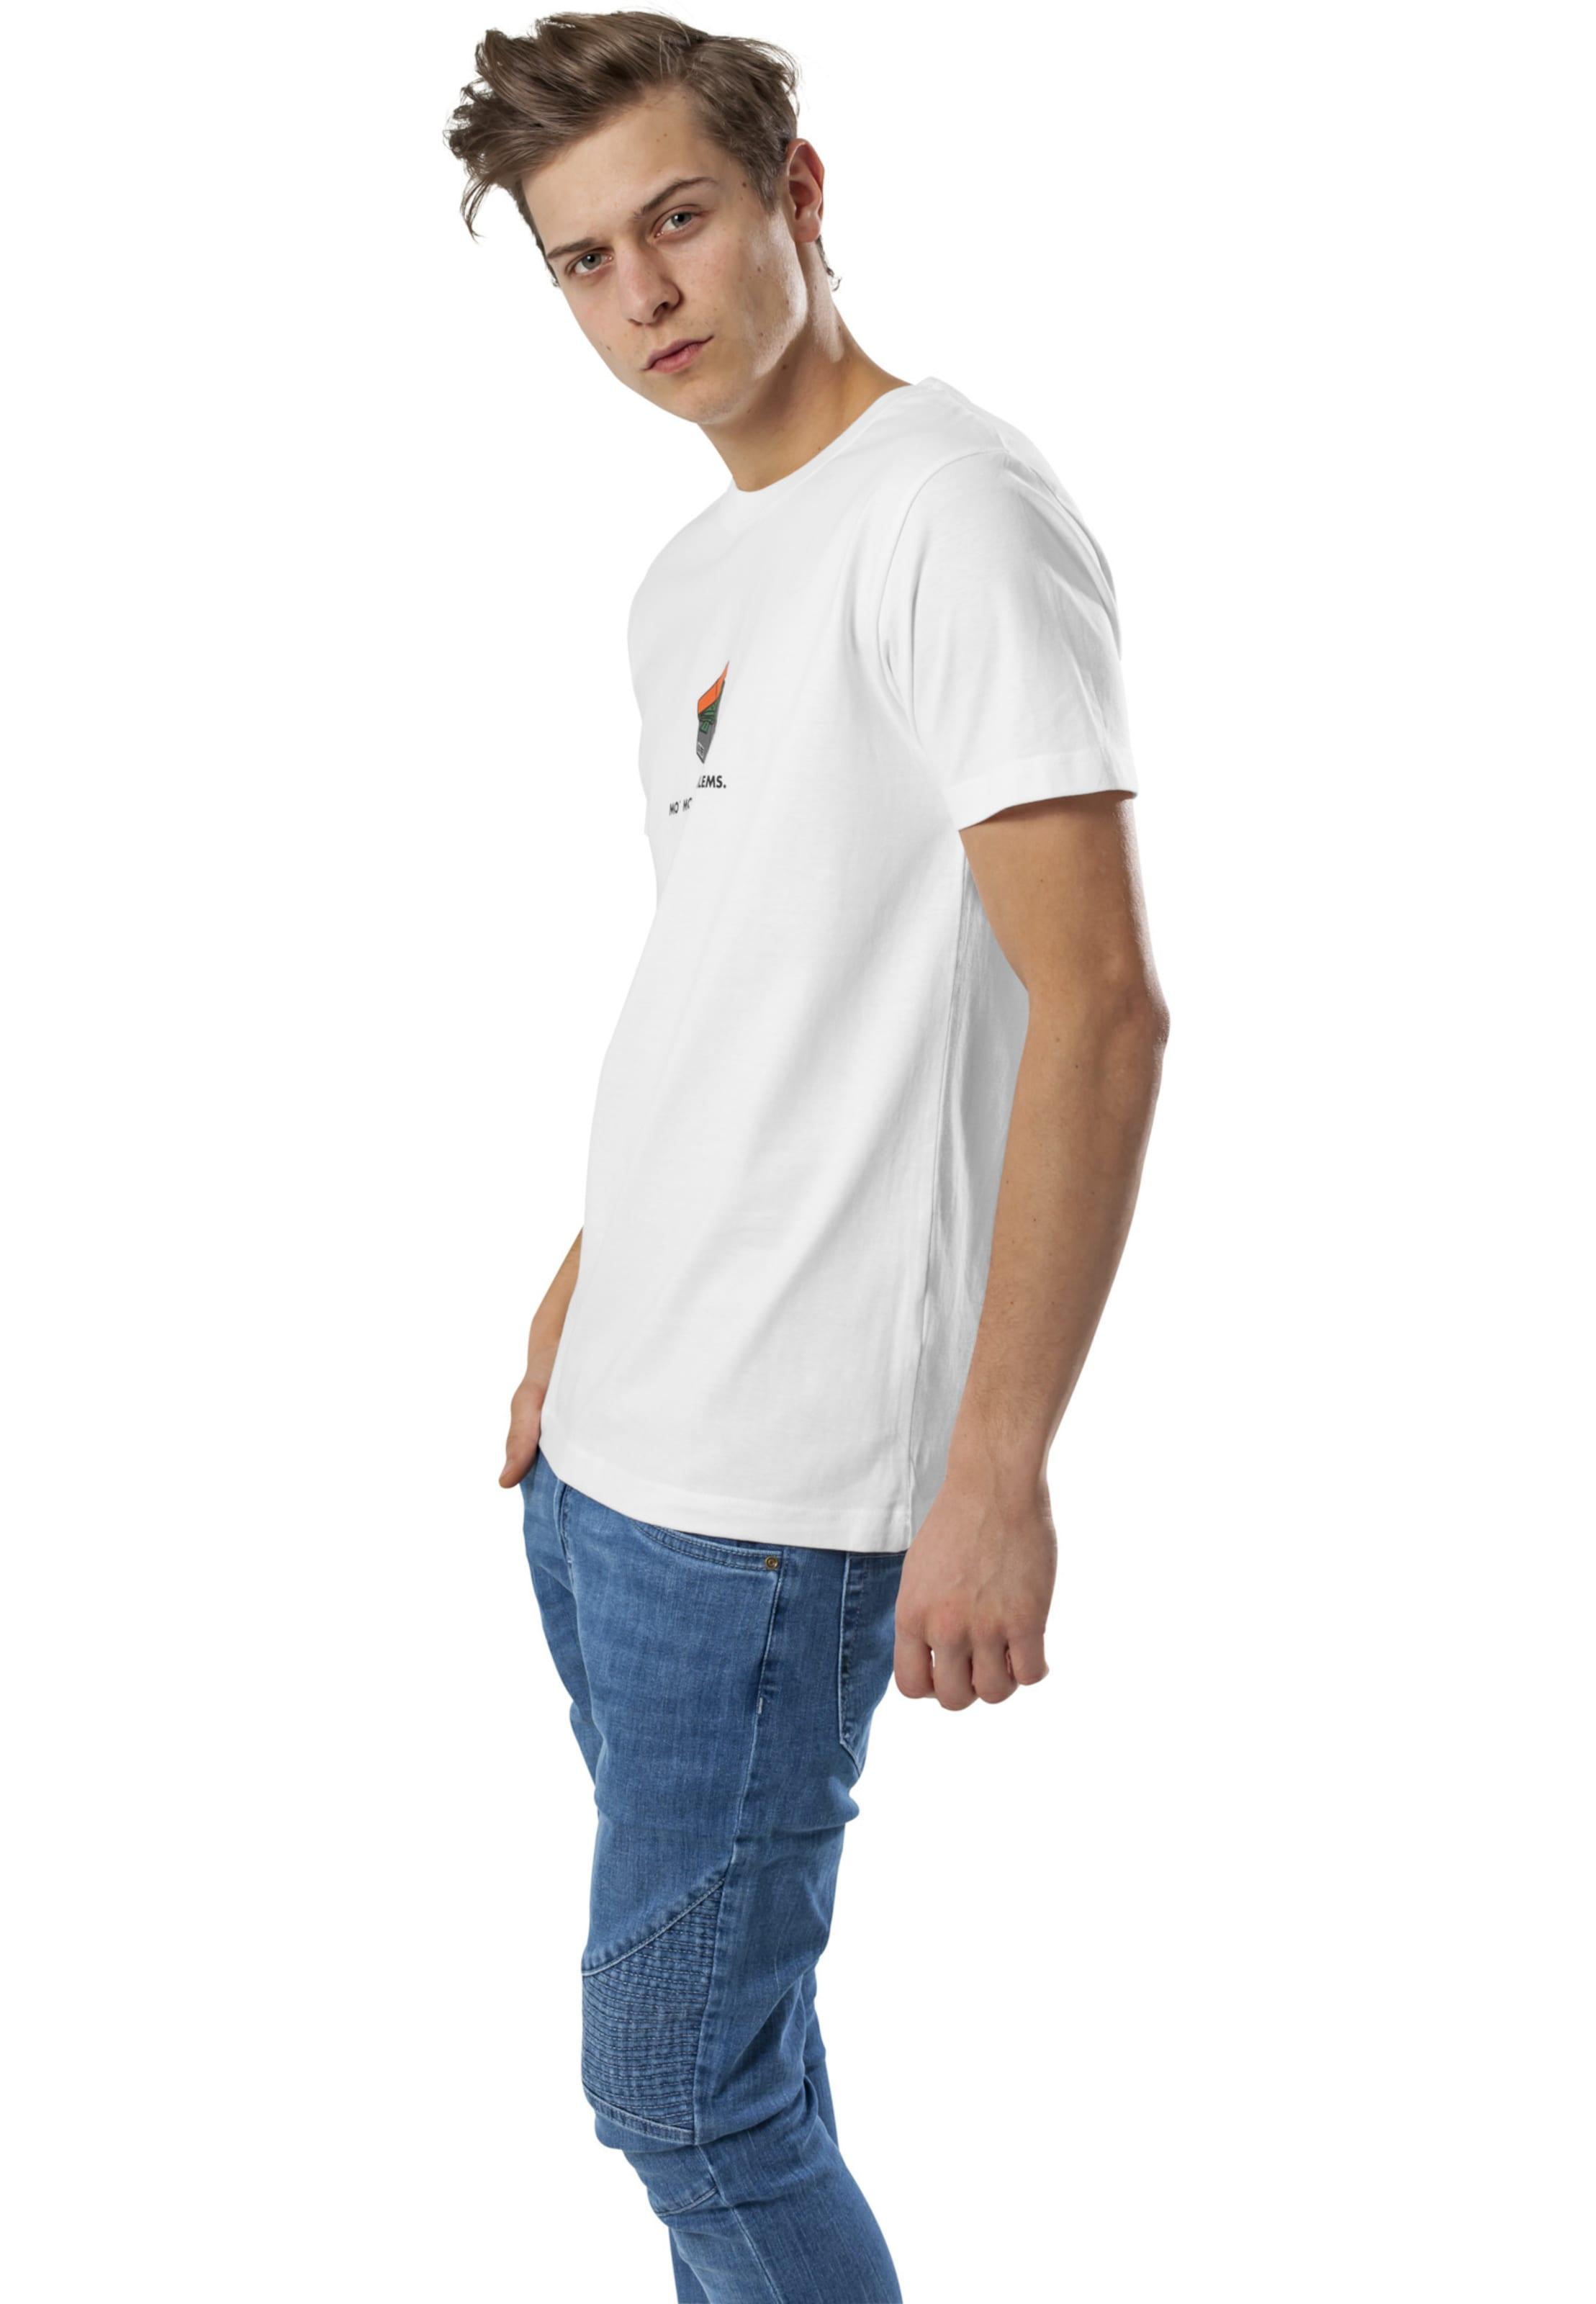 Tee Grasgrün Schwarz Shirt In Weiß Mister RostbraunDunkelgrau 'shoebox' orWQxdCBe